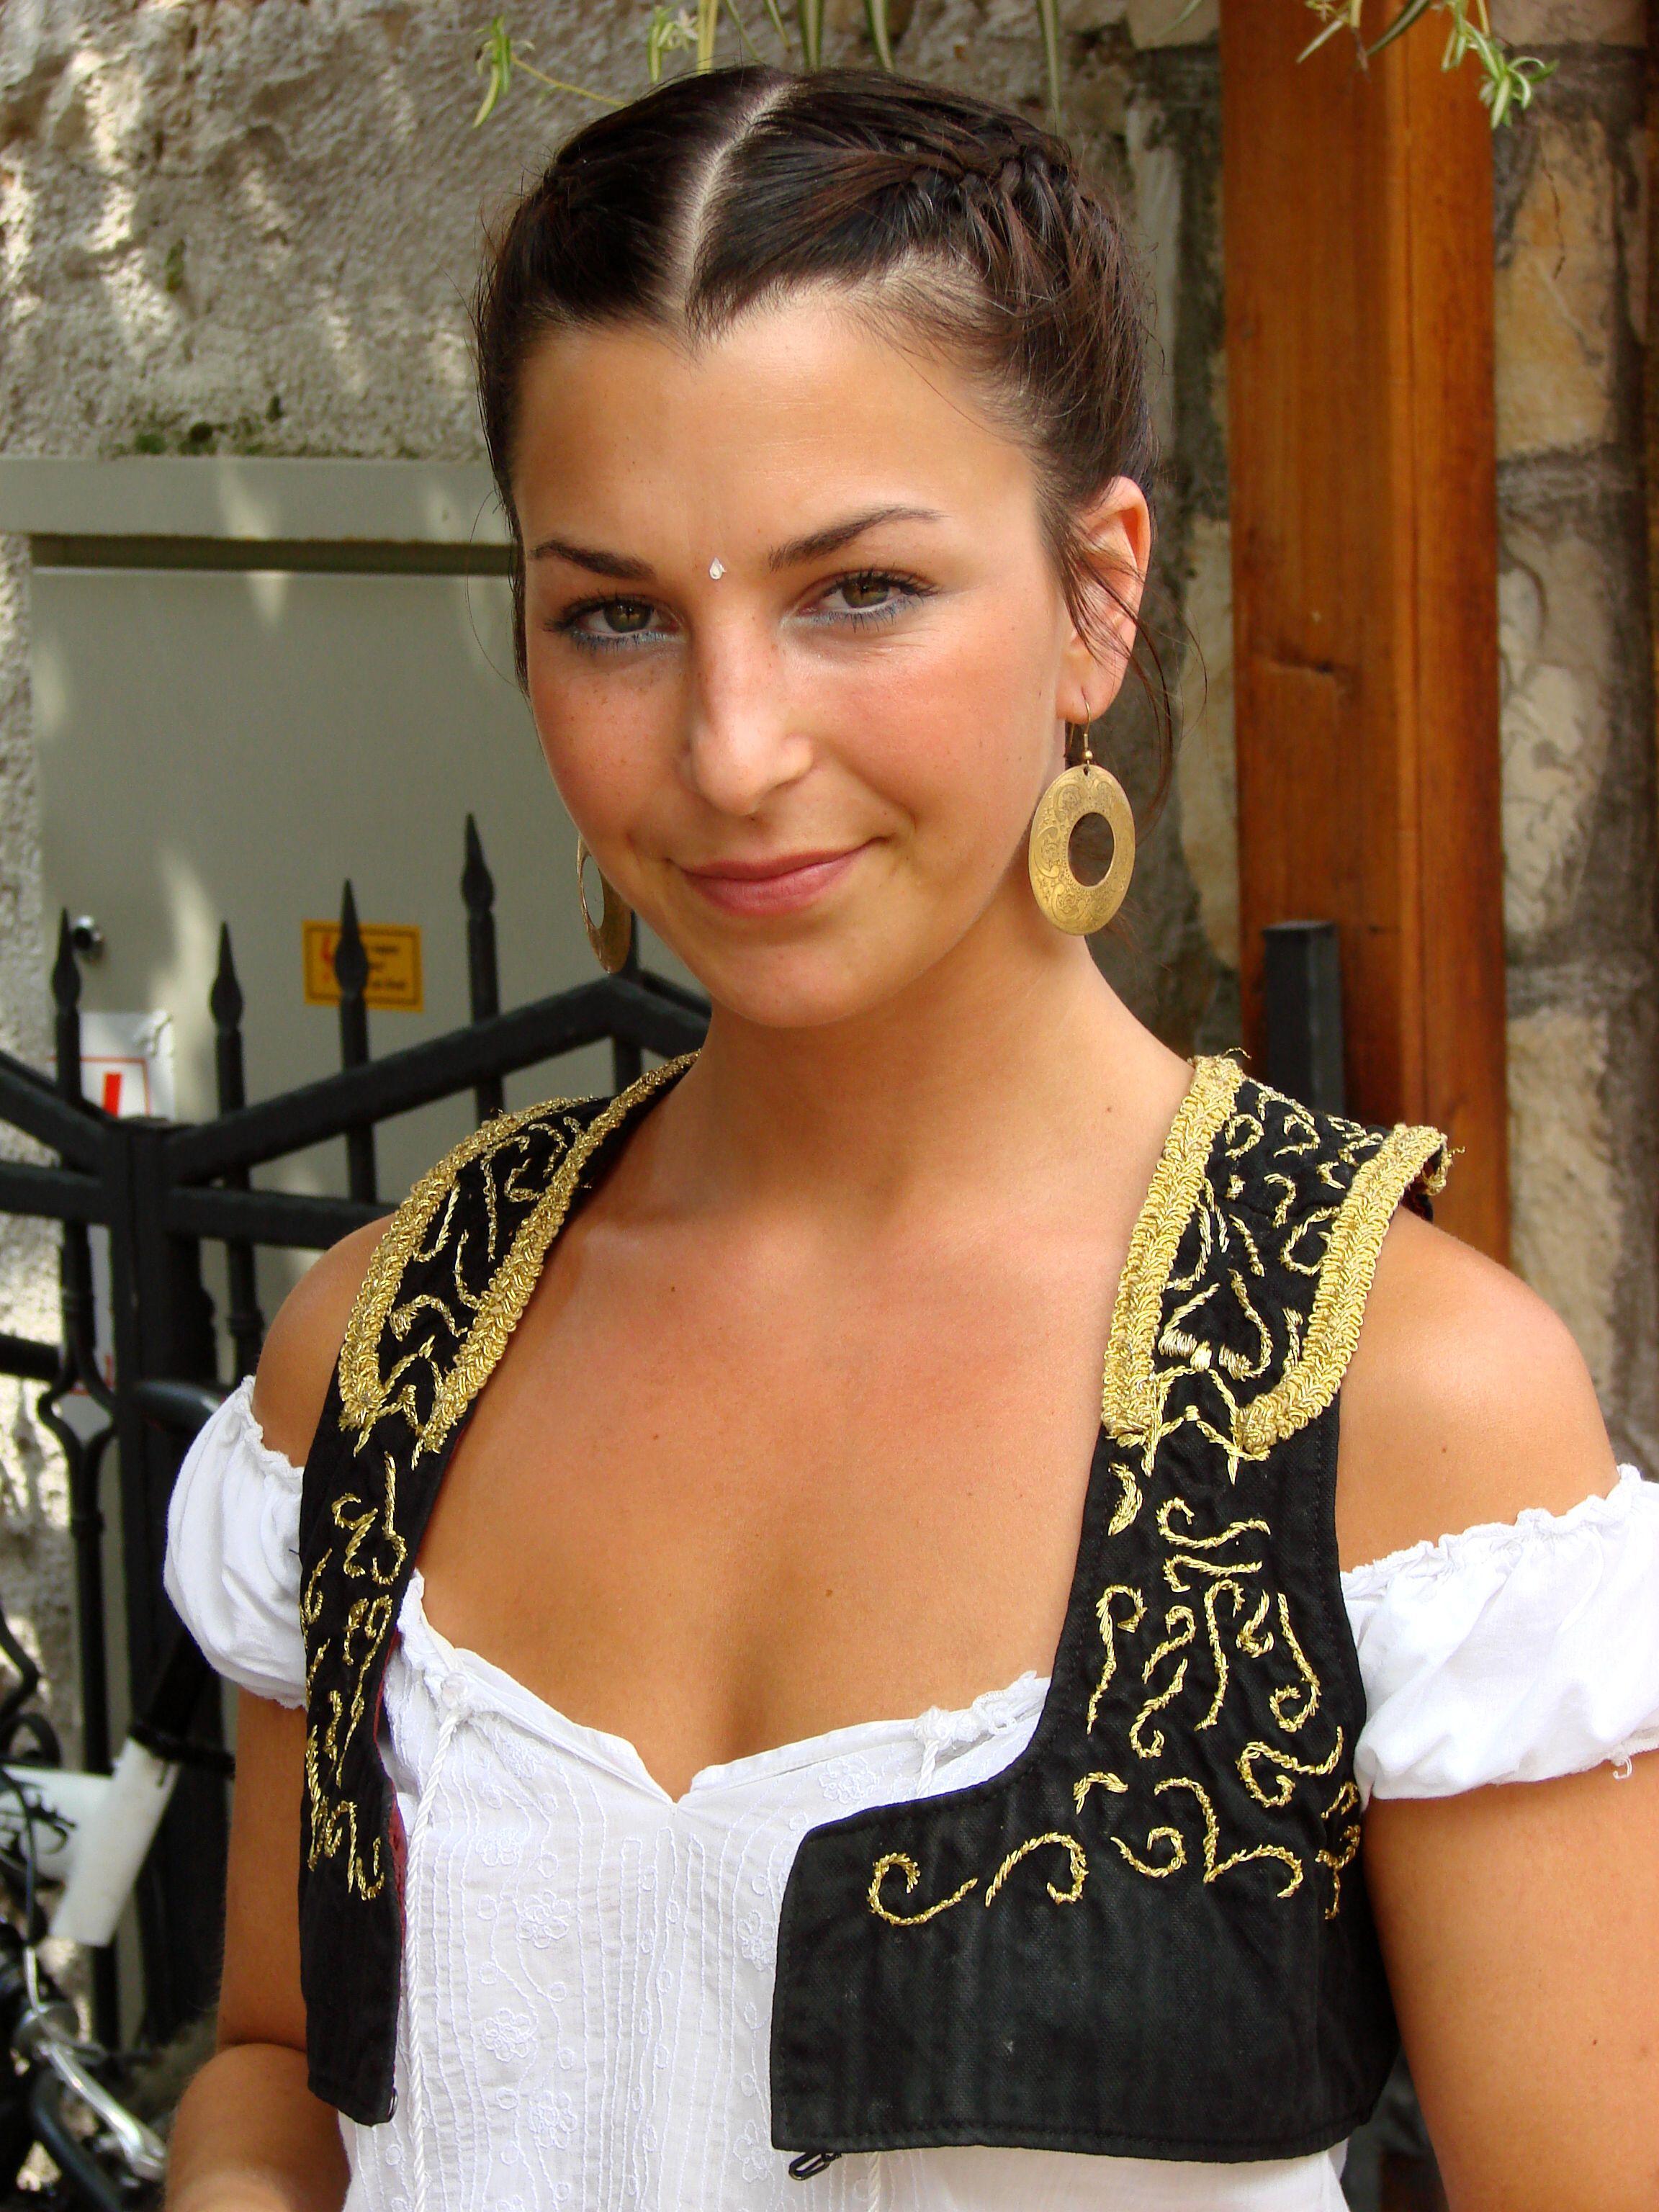 Sorry, Bosnia and herzegovina girls shoulders down